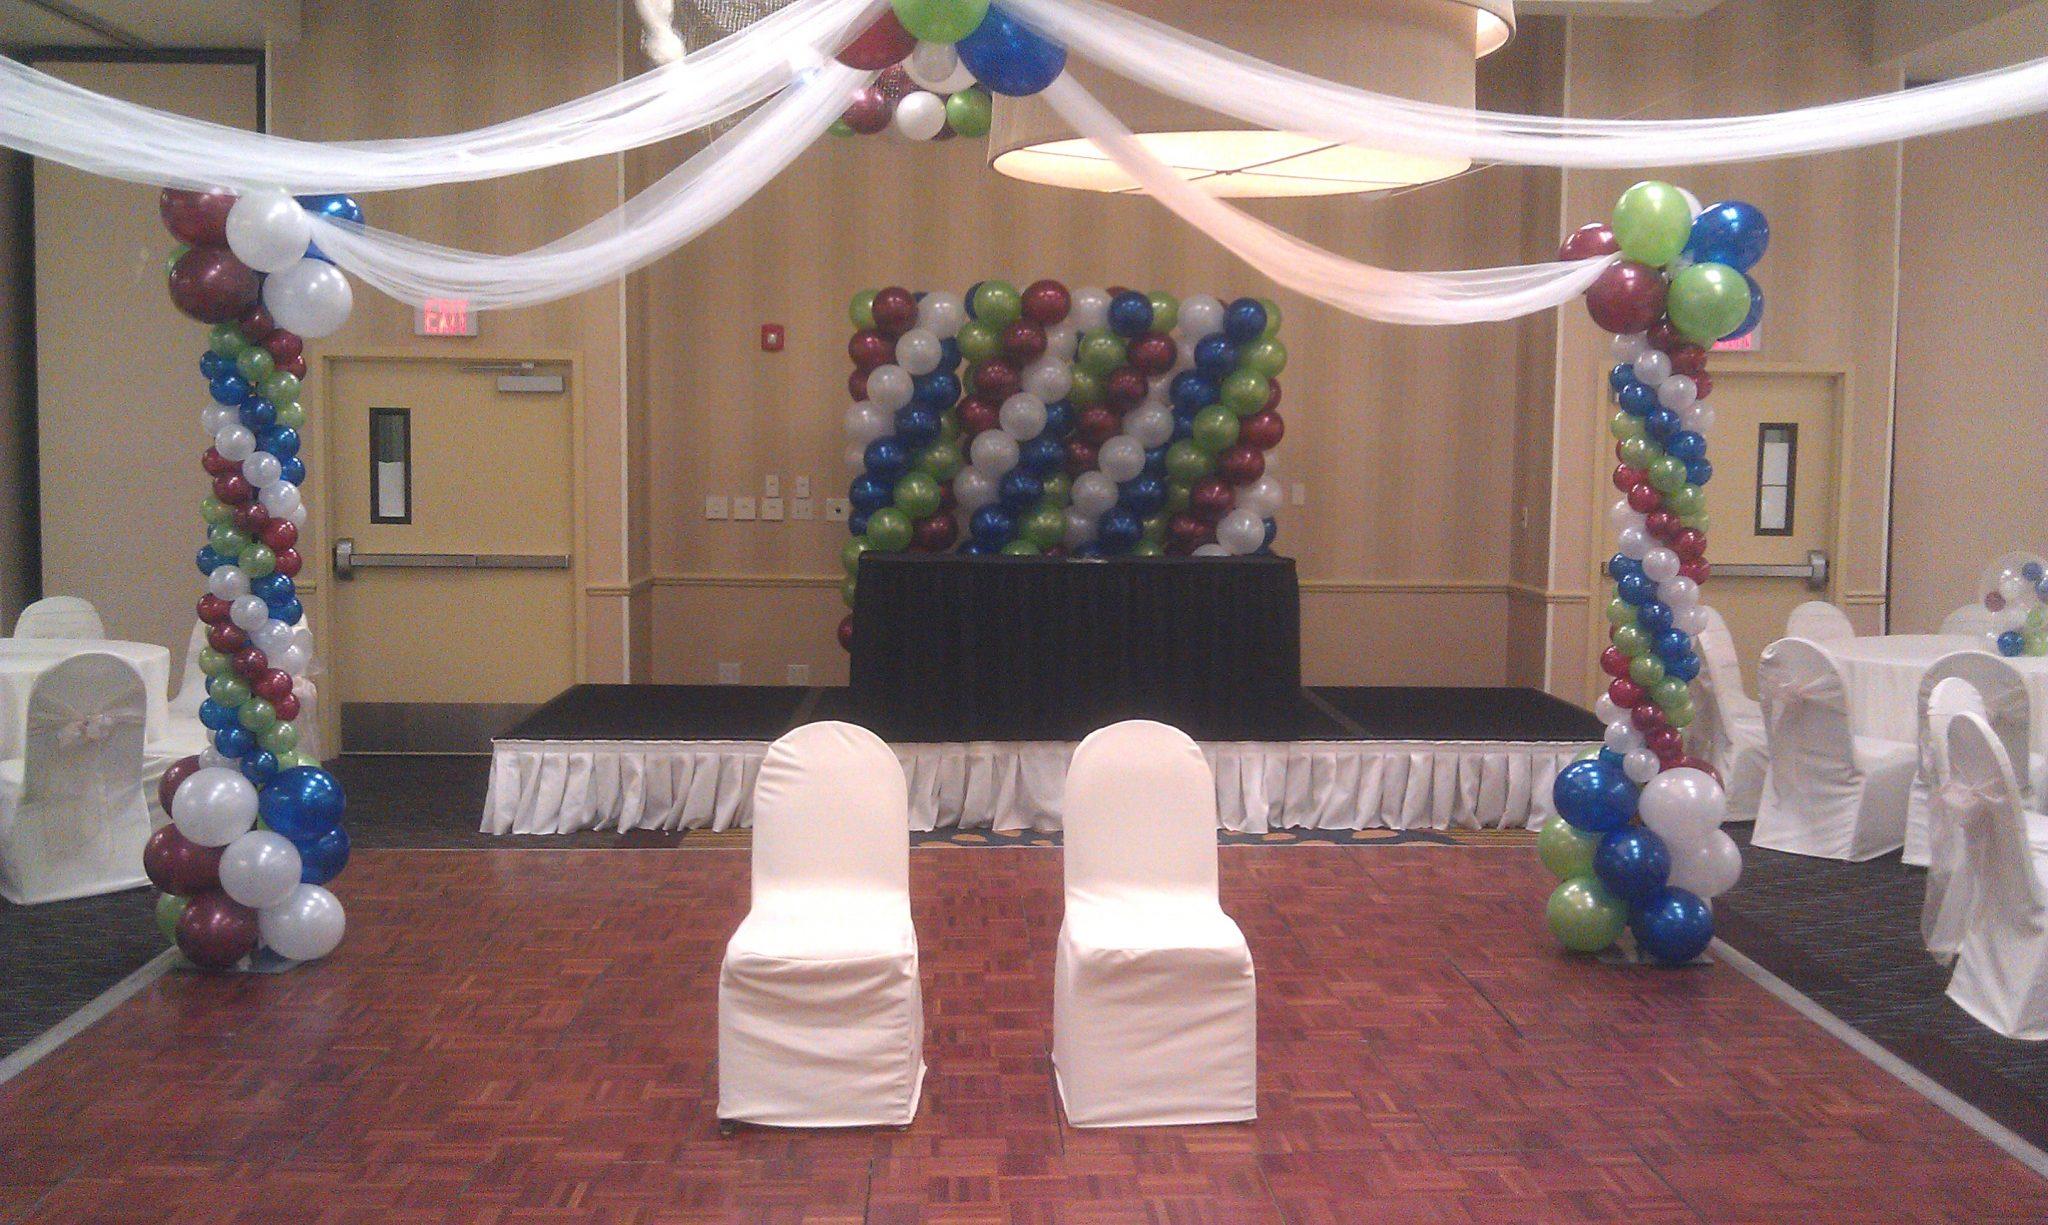 SAMMY J Balloon Creations st louis balloons dance floor canopy column